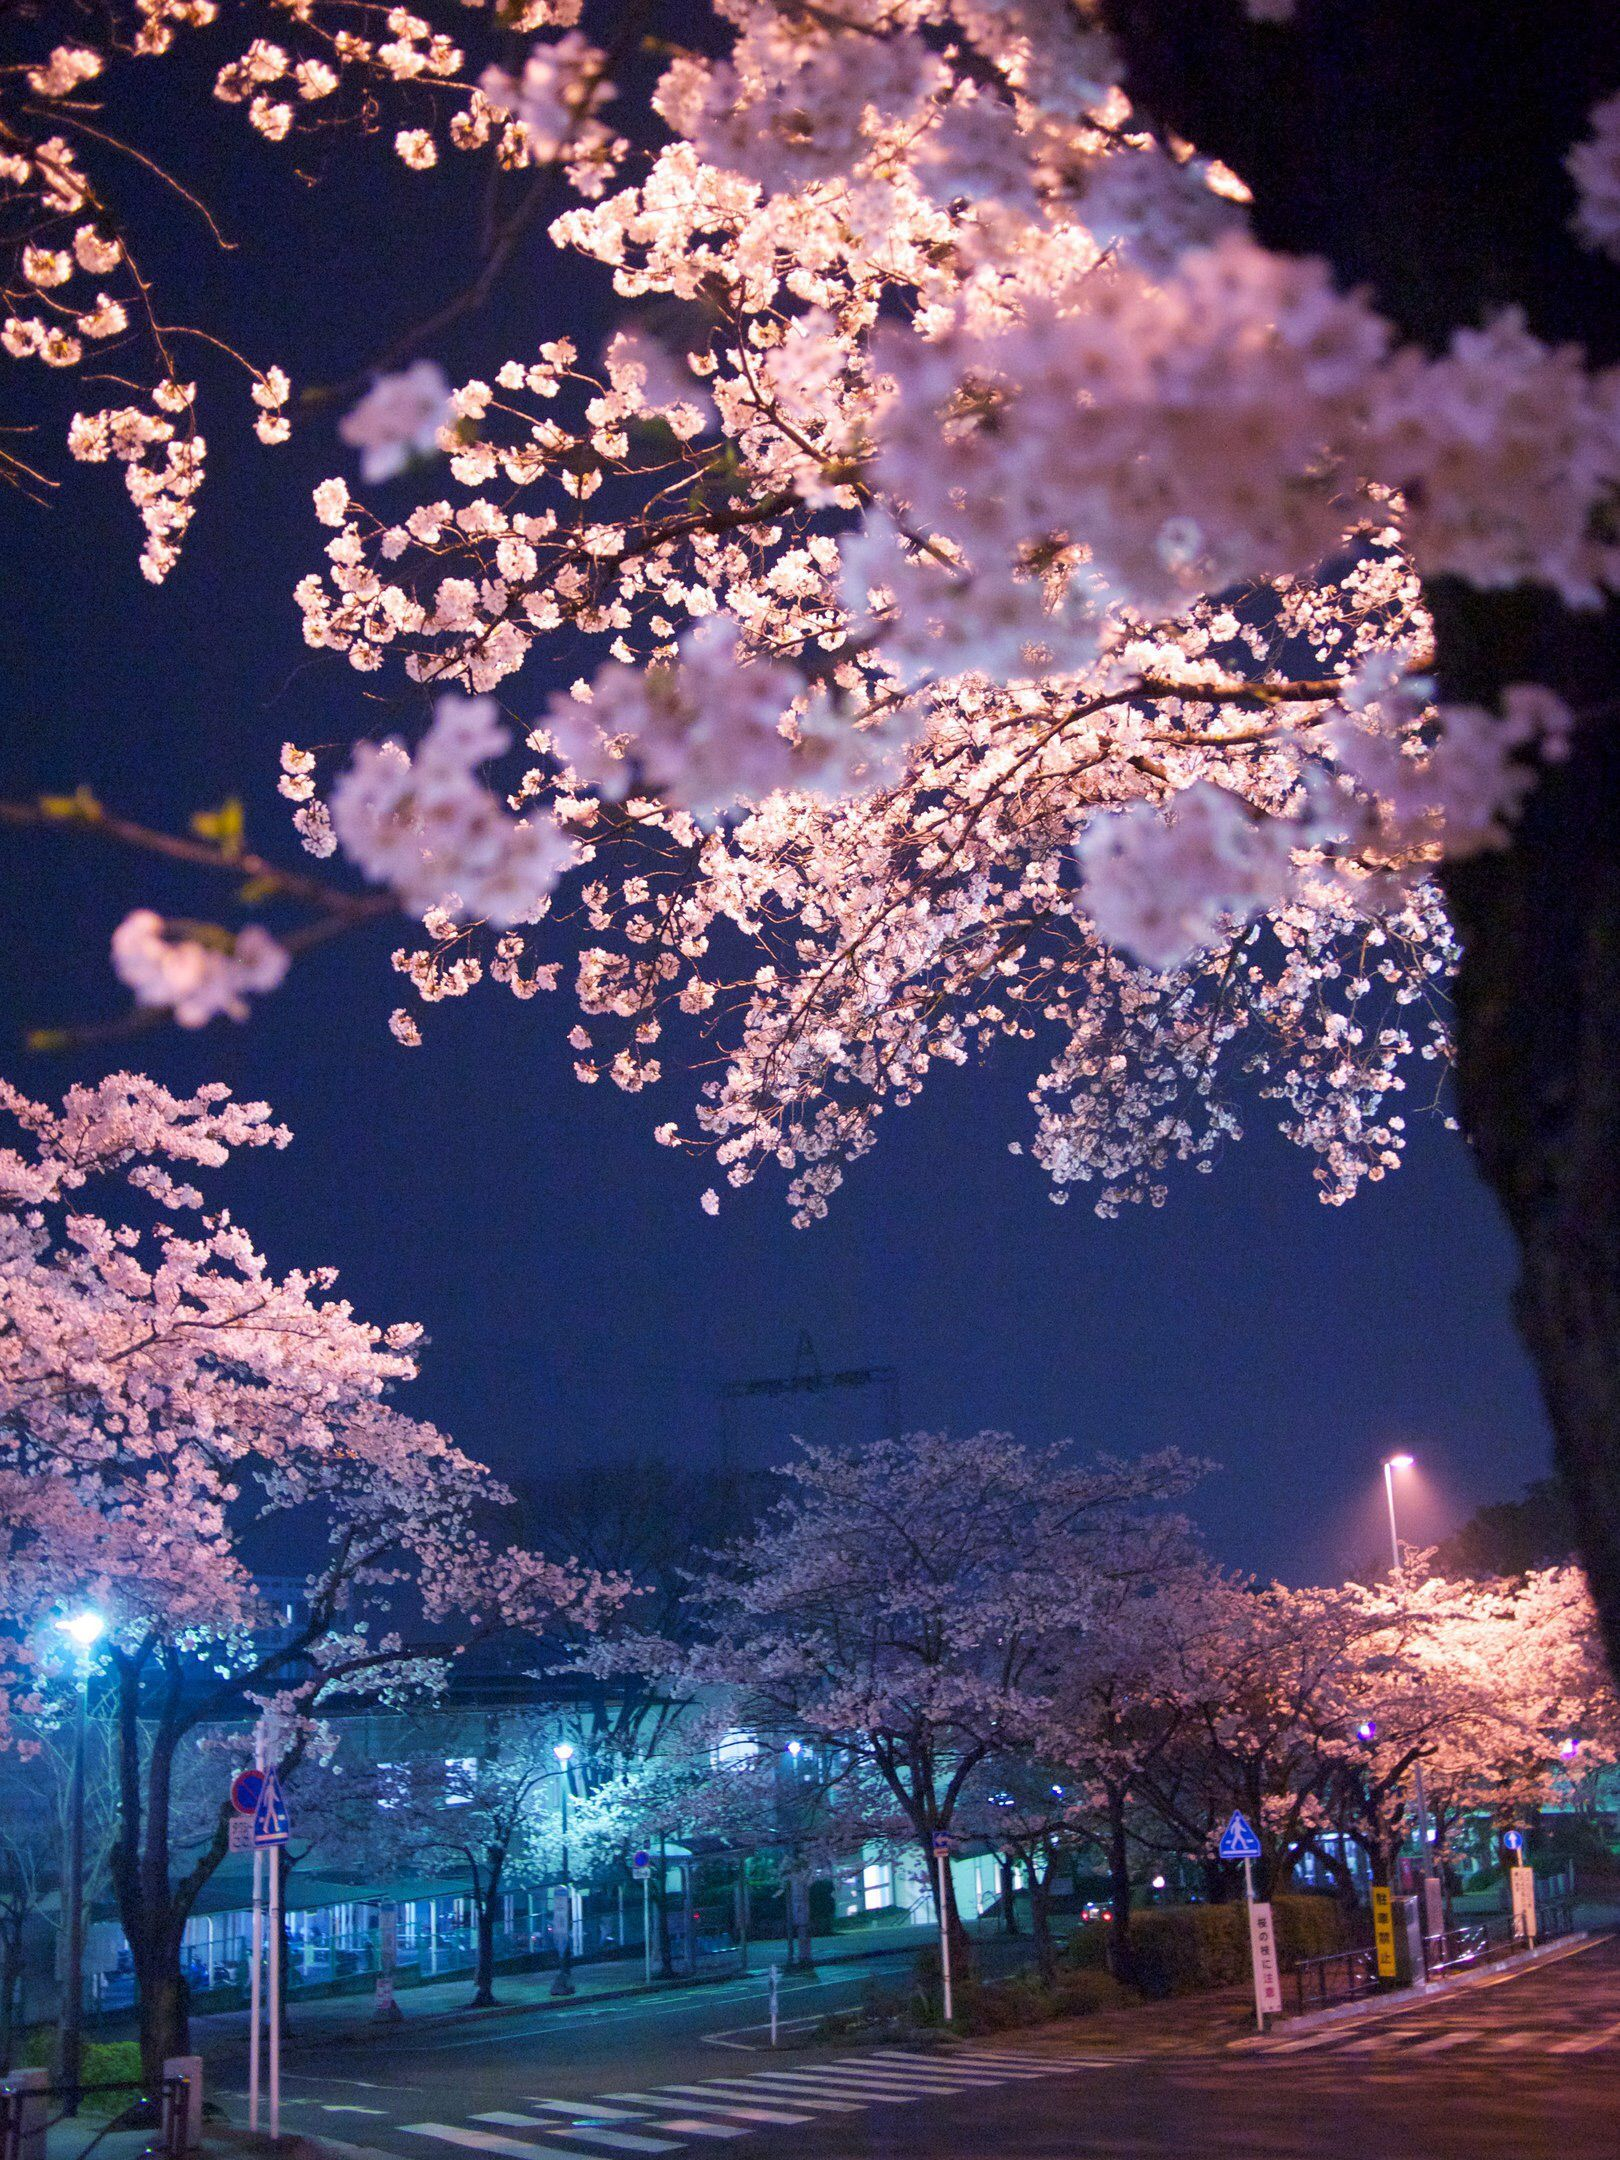 Pin By Tư Nam On Crime Cherry Blossom Japan Blossom Trees Hanami